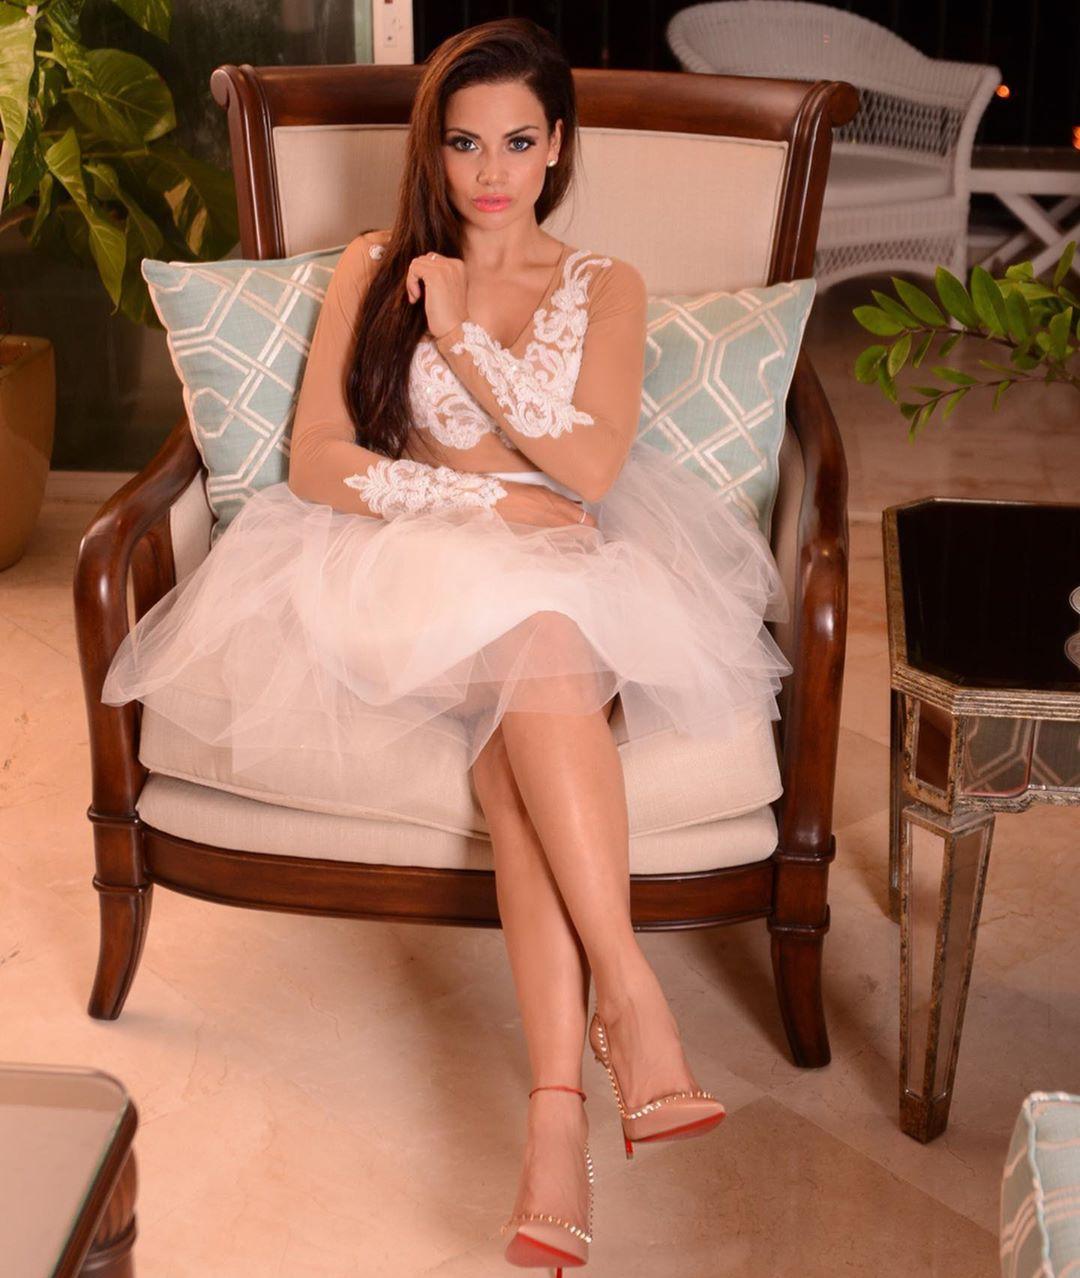 Samantha Sepulveda Instagram, Group International Model